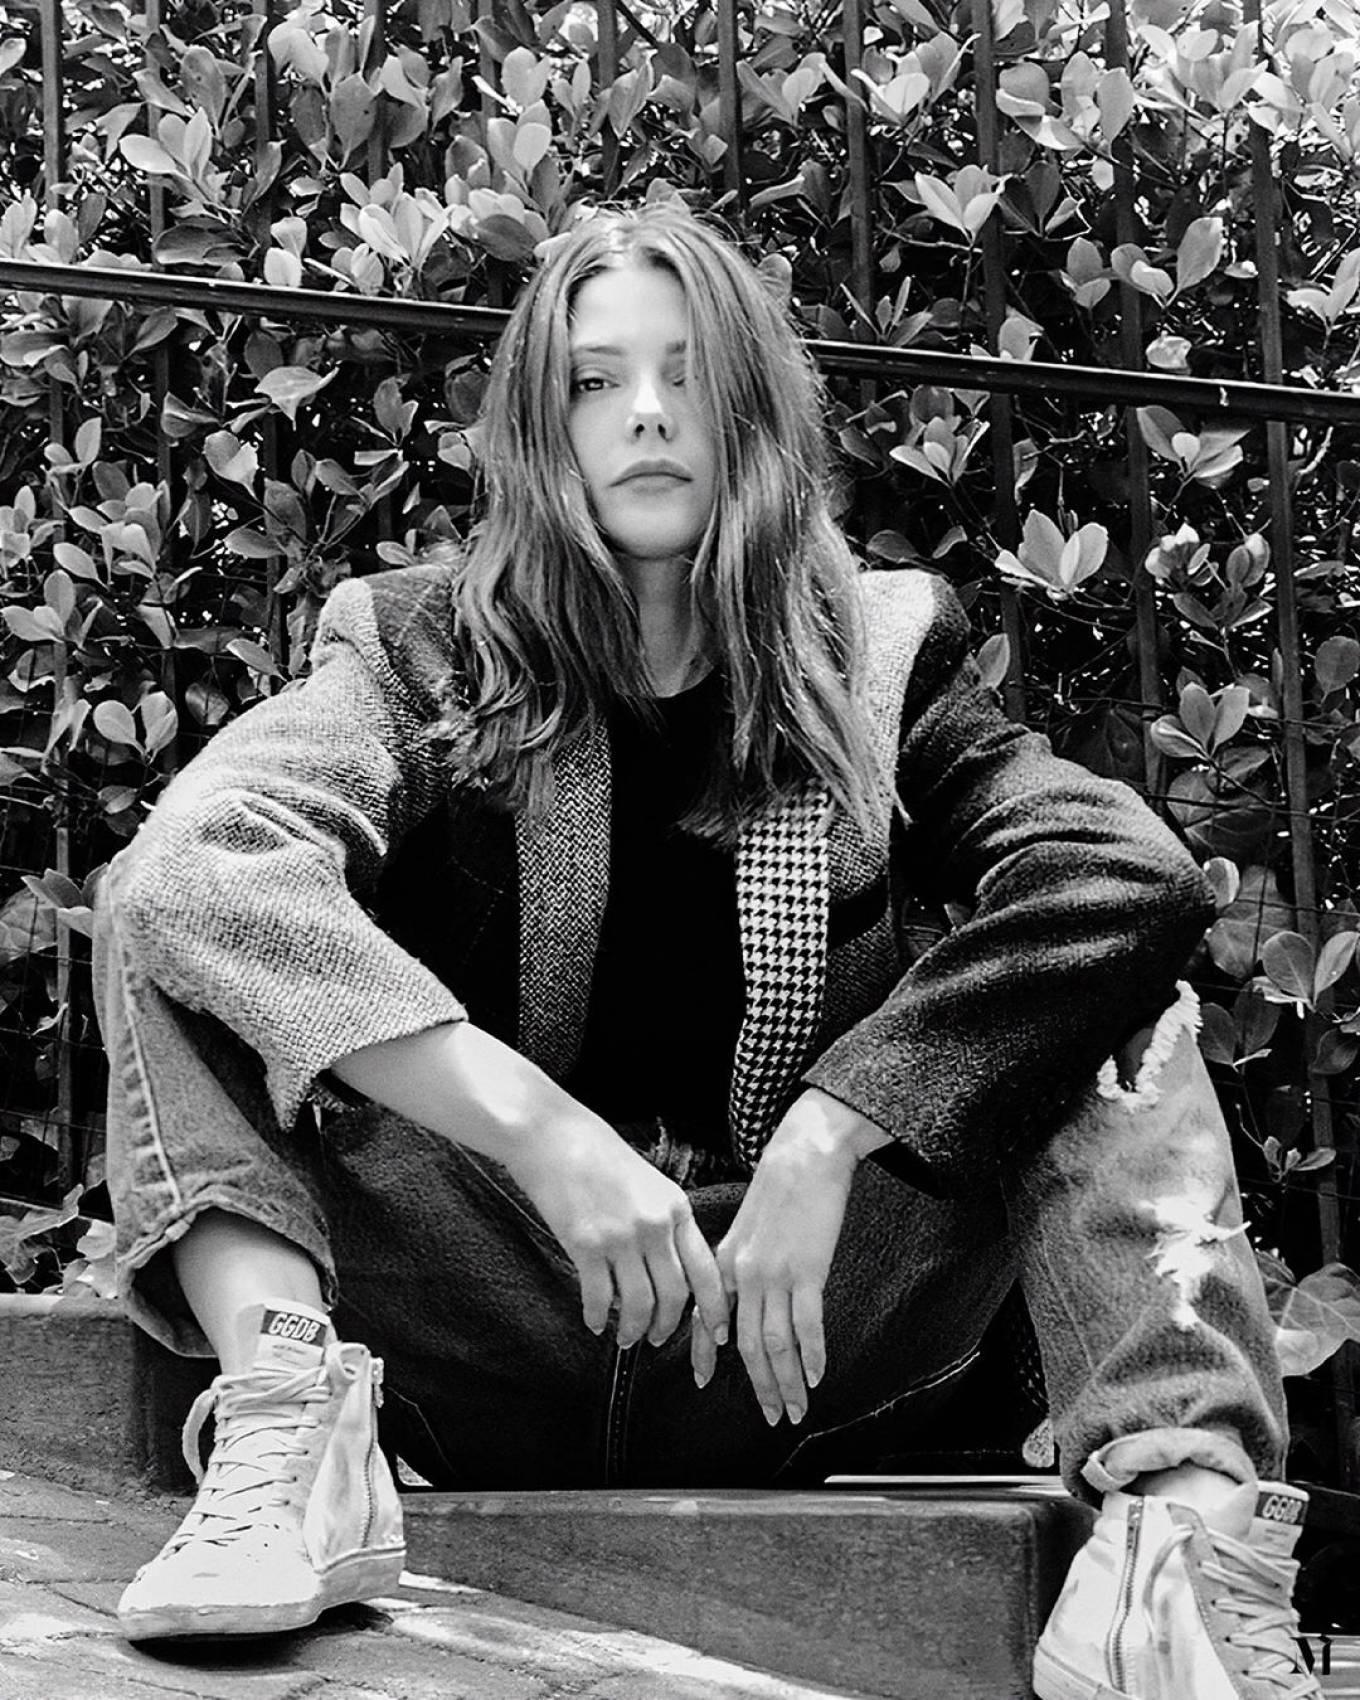 Ashley Greene 2020 : Ashley Greene – Revista de Milenio magazine (Issue 03 – 2020)-11